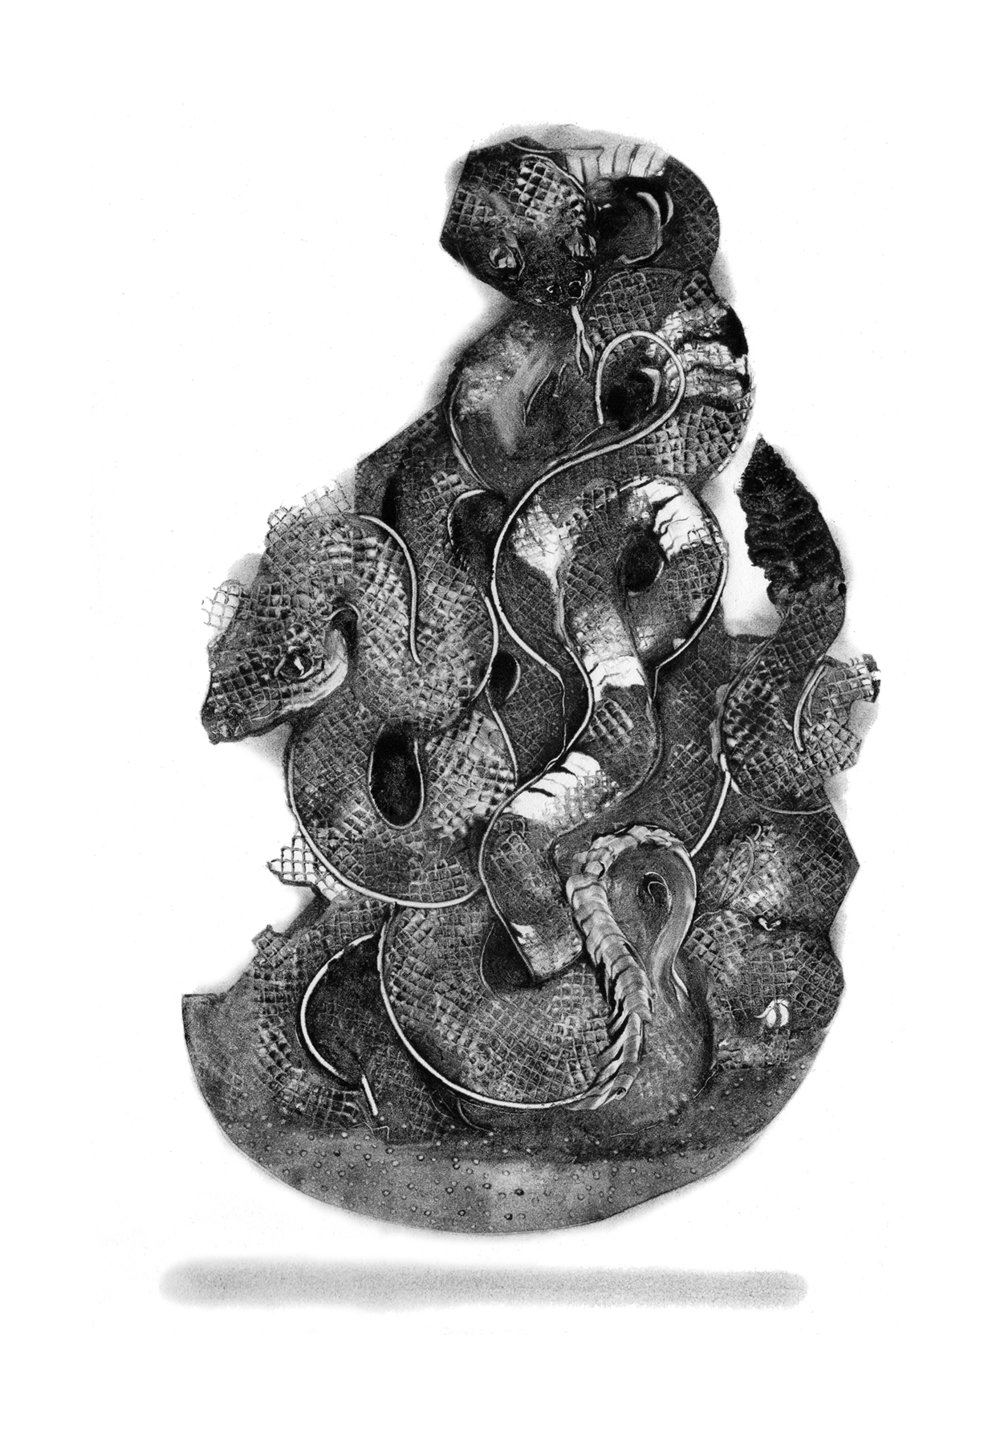 snake collage by Grady Gordon at Public Land in Sacramento